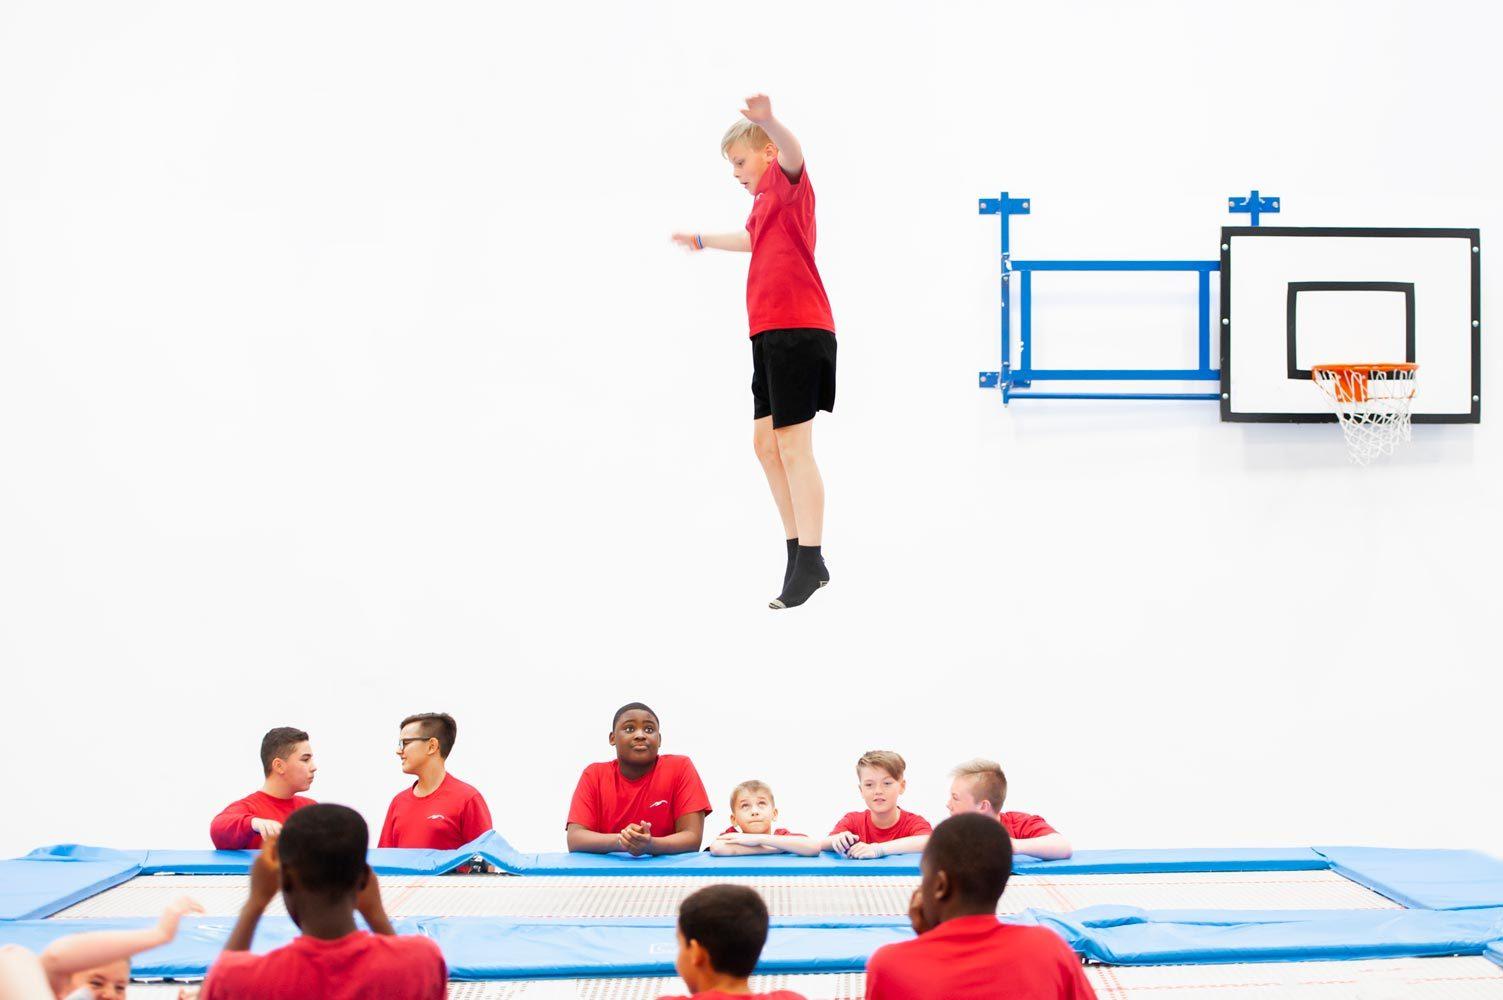 Photography of school children trampoling